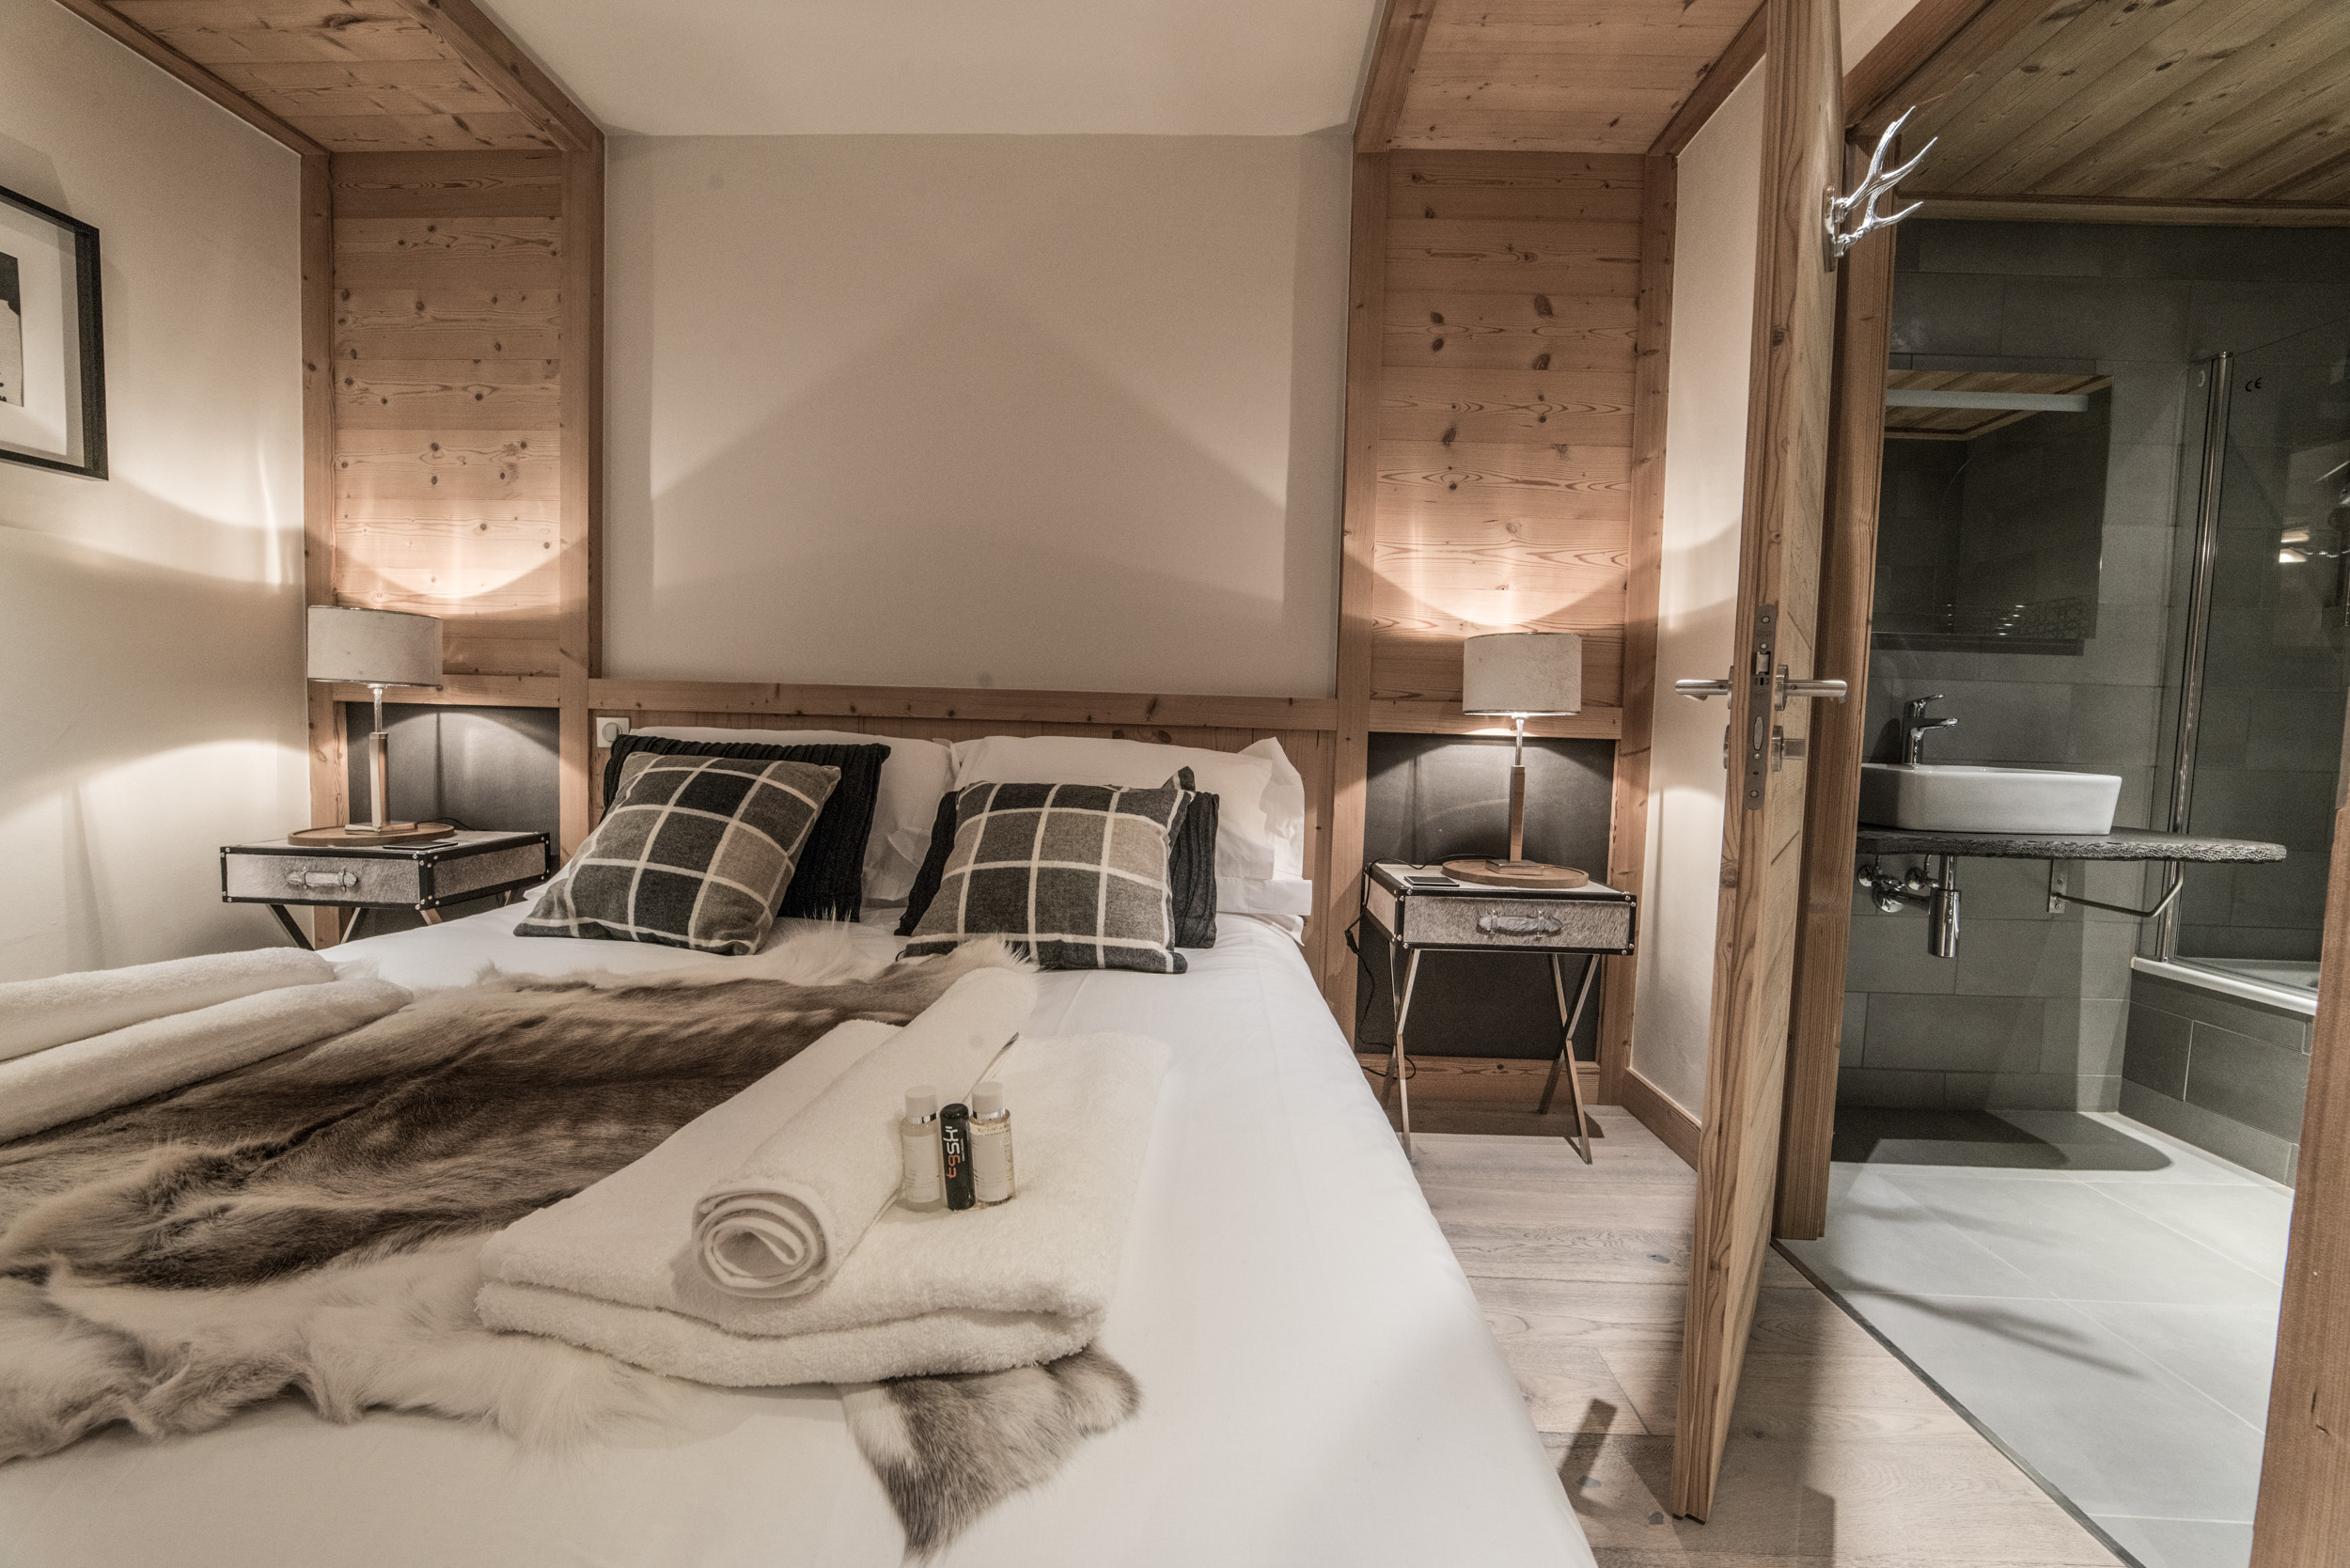 Les Pierrys bedroom 1 with en-suite bathroom